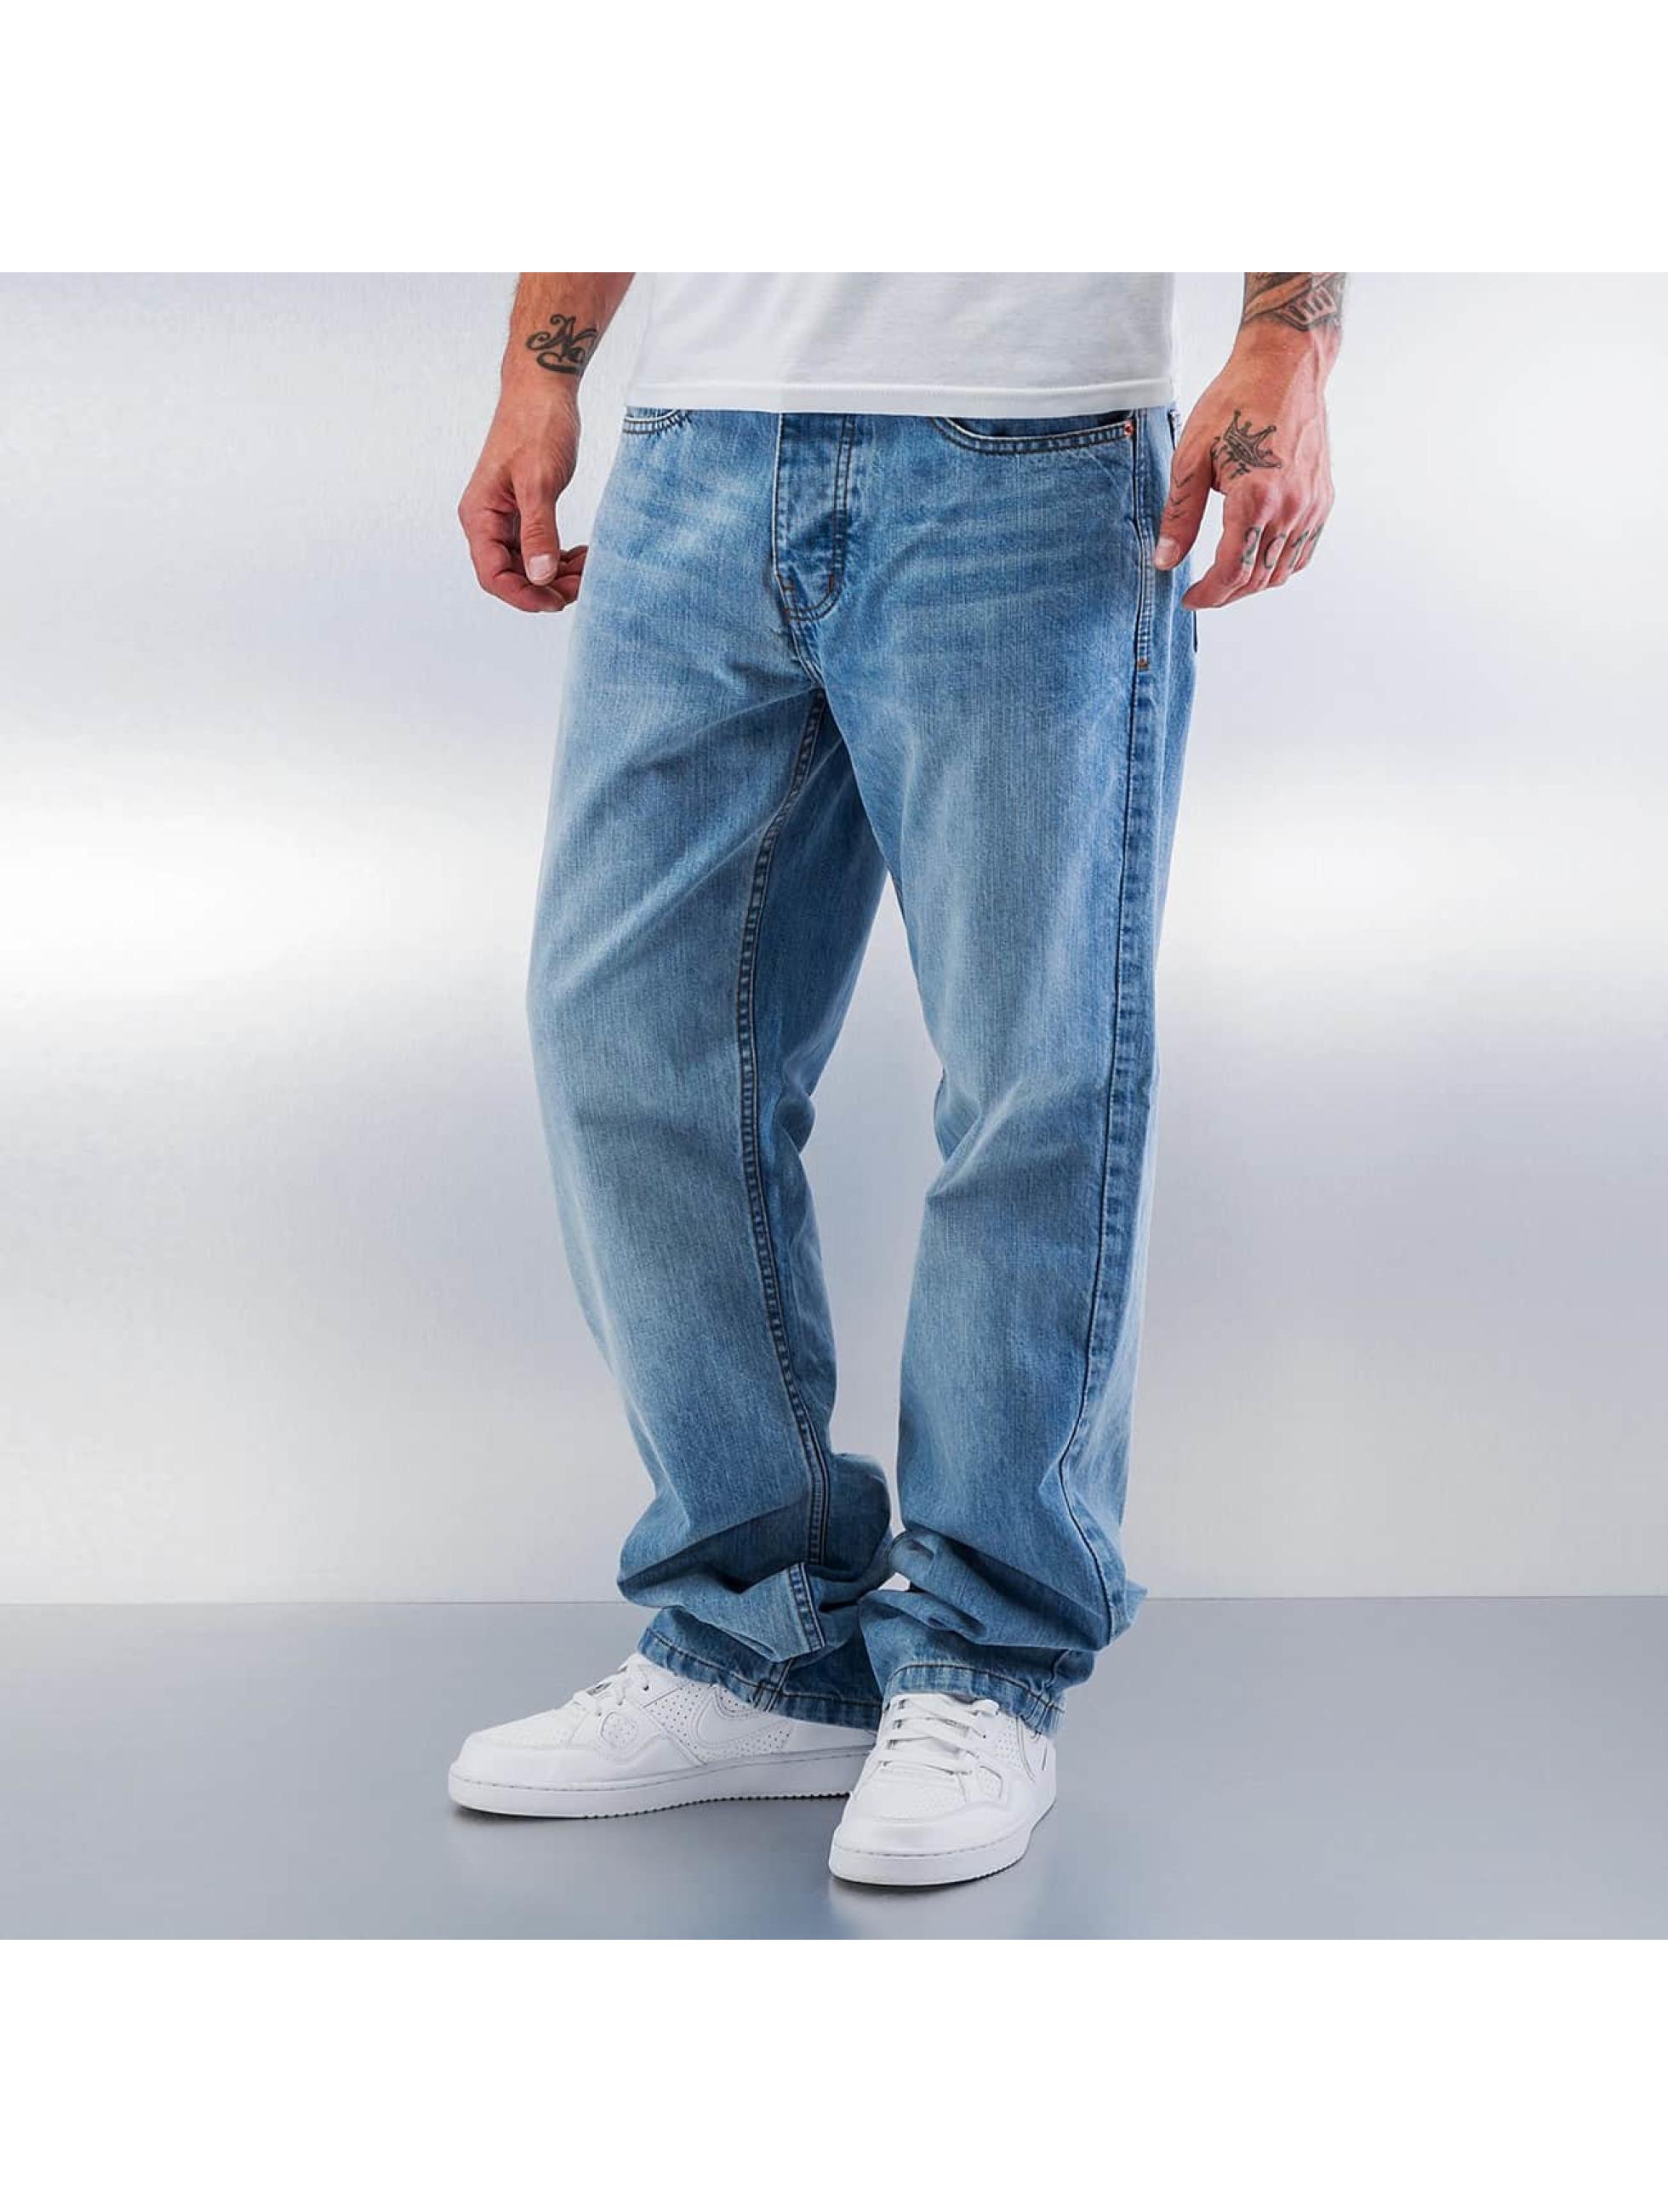 rocawear herren loose fit jeans tap in blau 270726. Black Bedroom Furniture Sets. Home Design Ideas